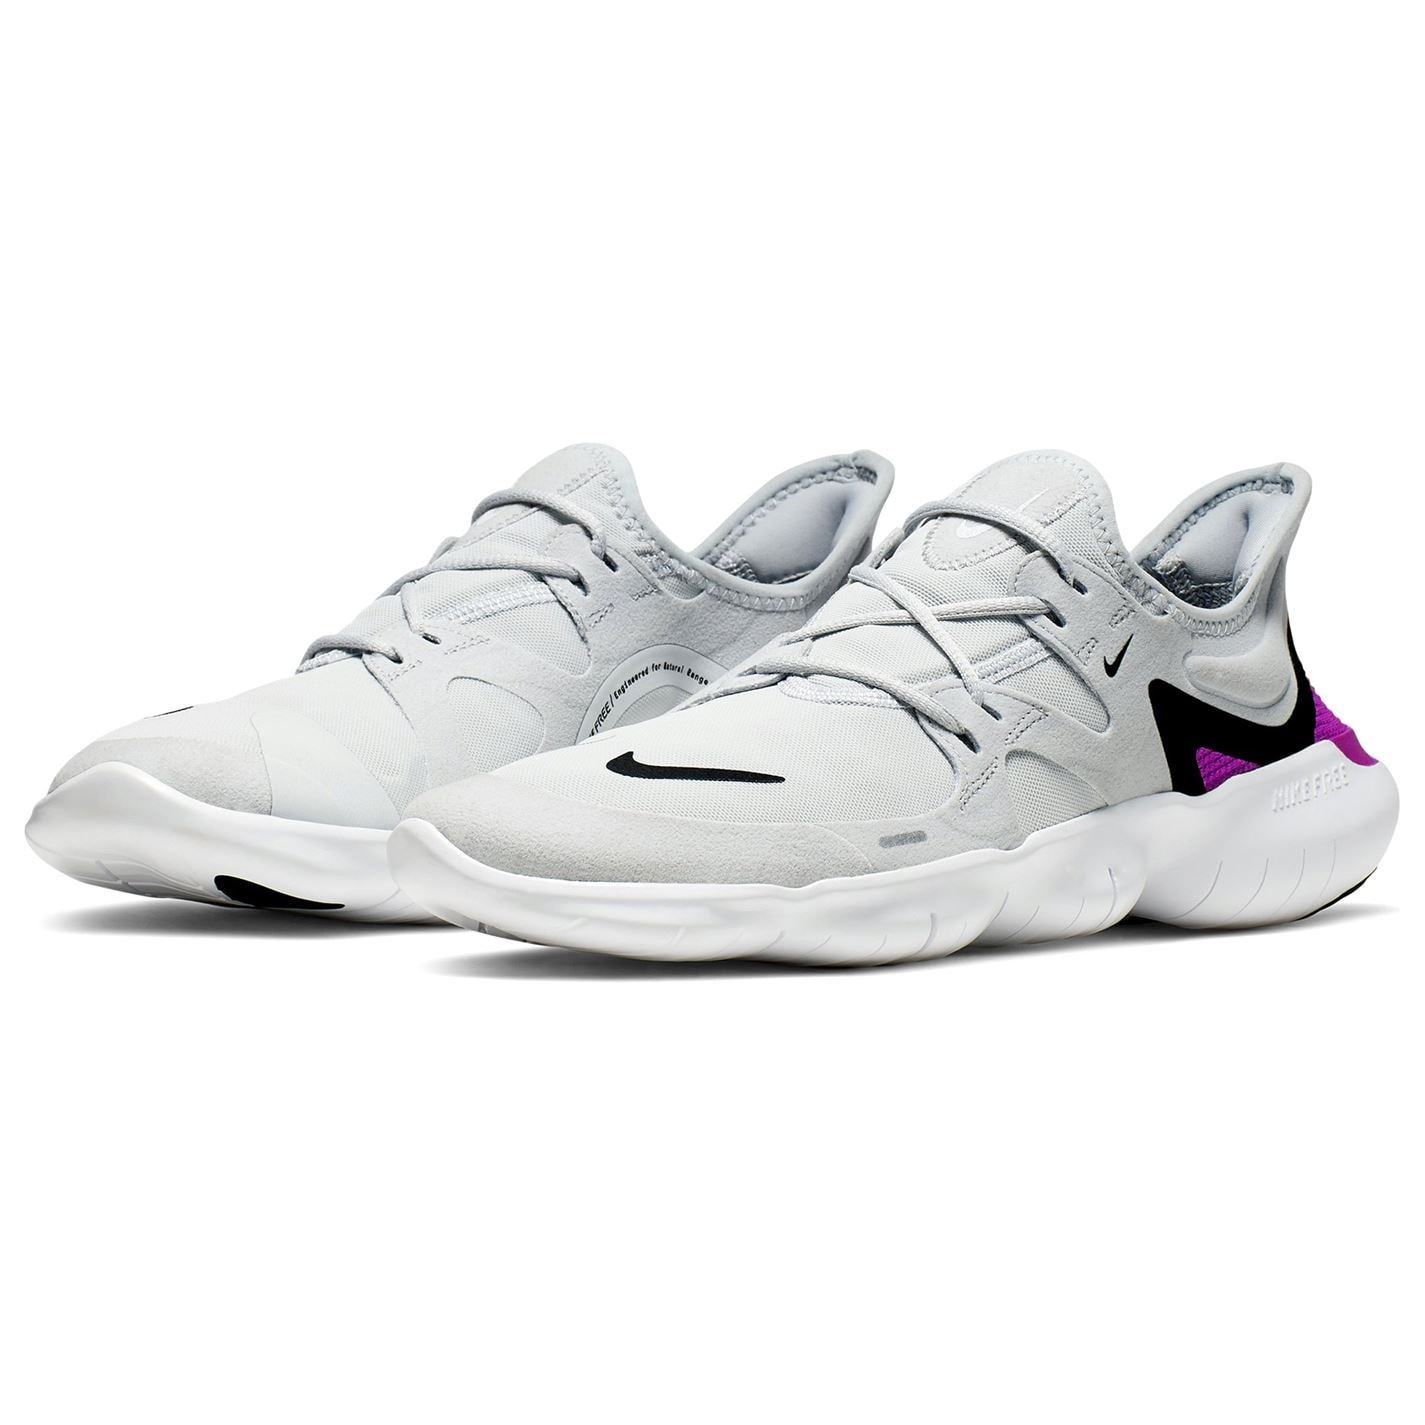 Nike Free Rn 5 0 Running Trainers Mens Grey White Footwear Athleisure Shoes Ebay